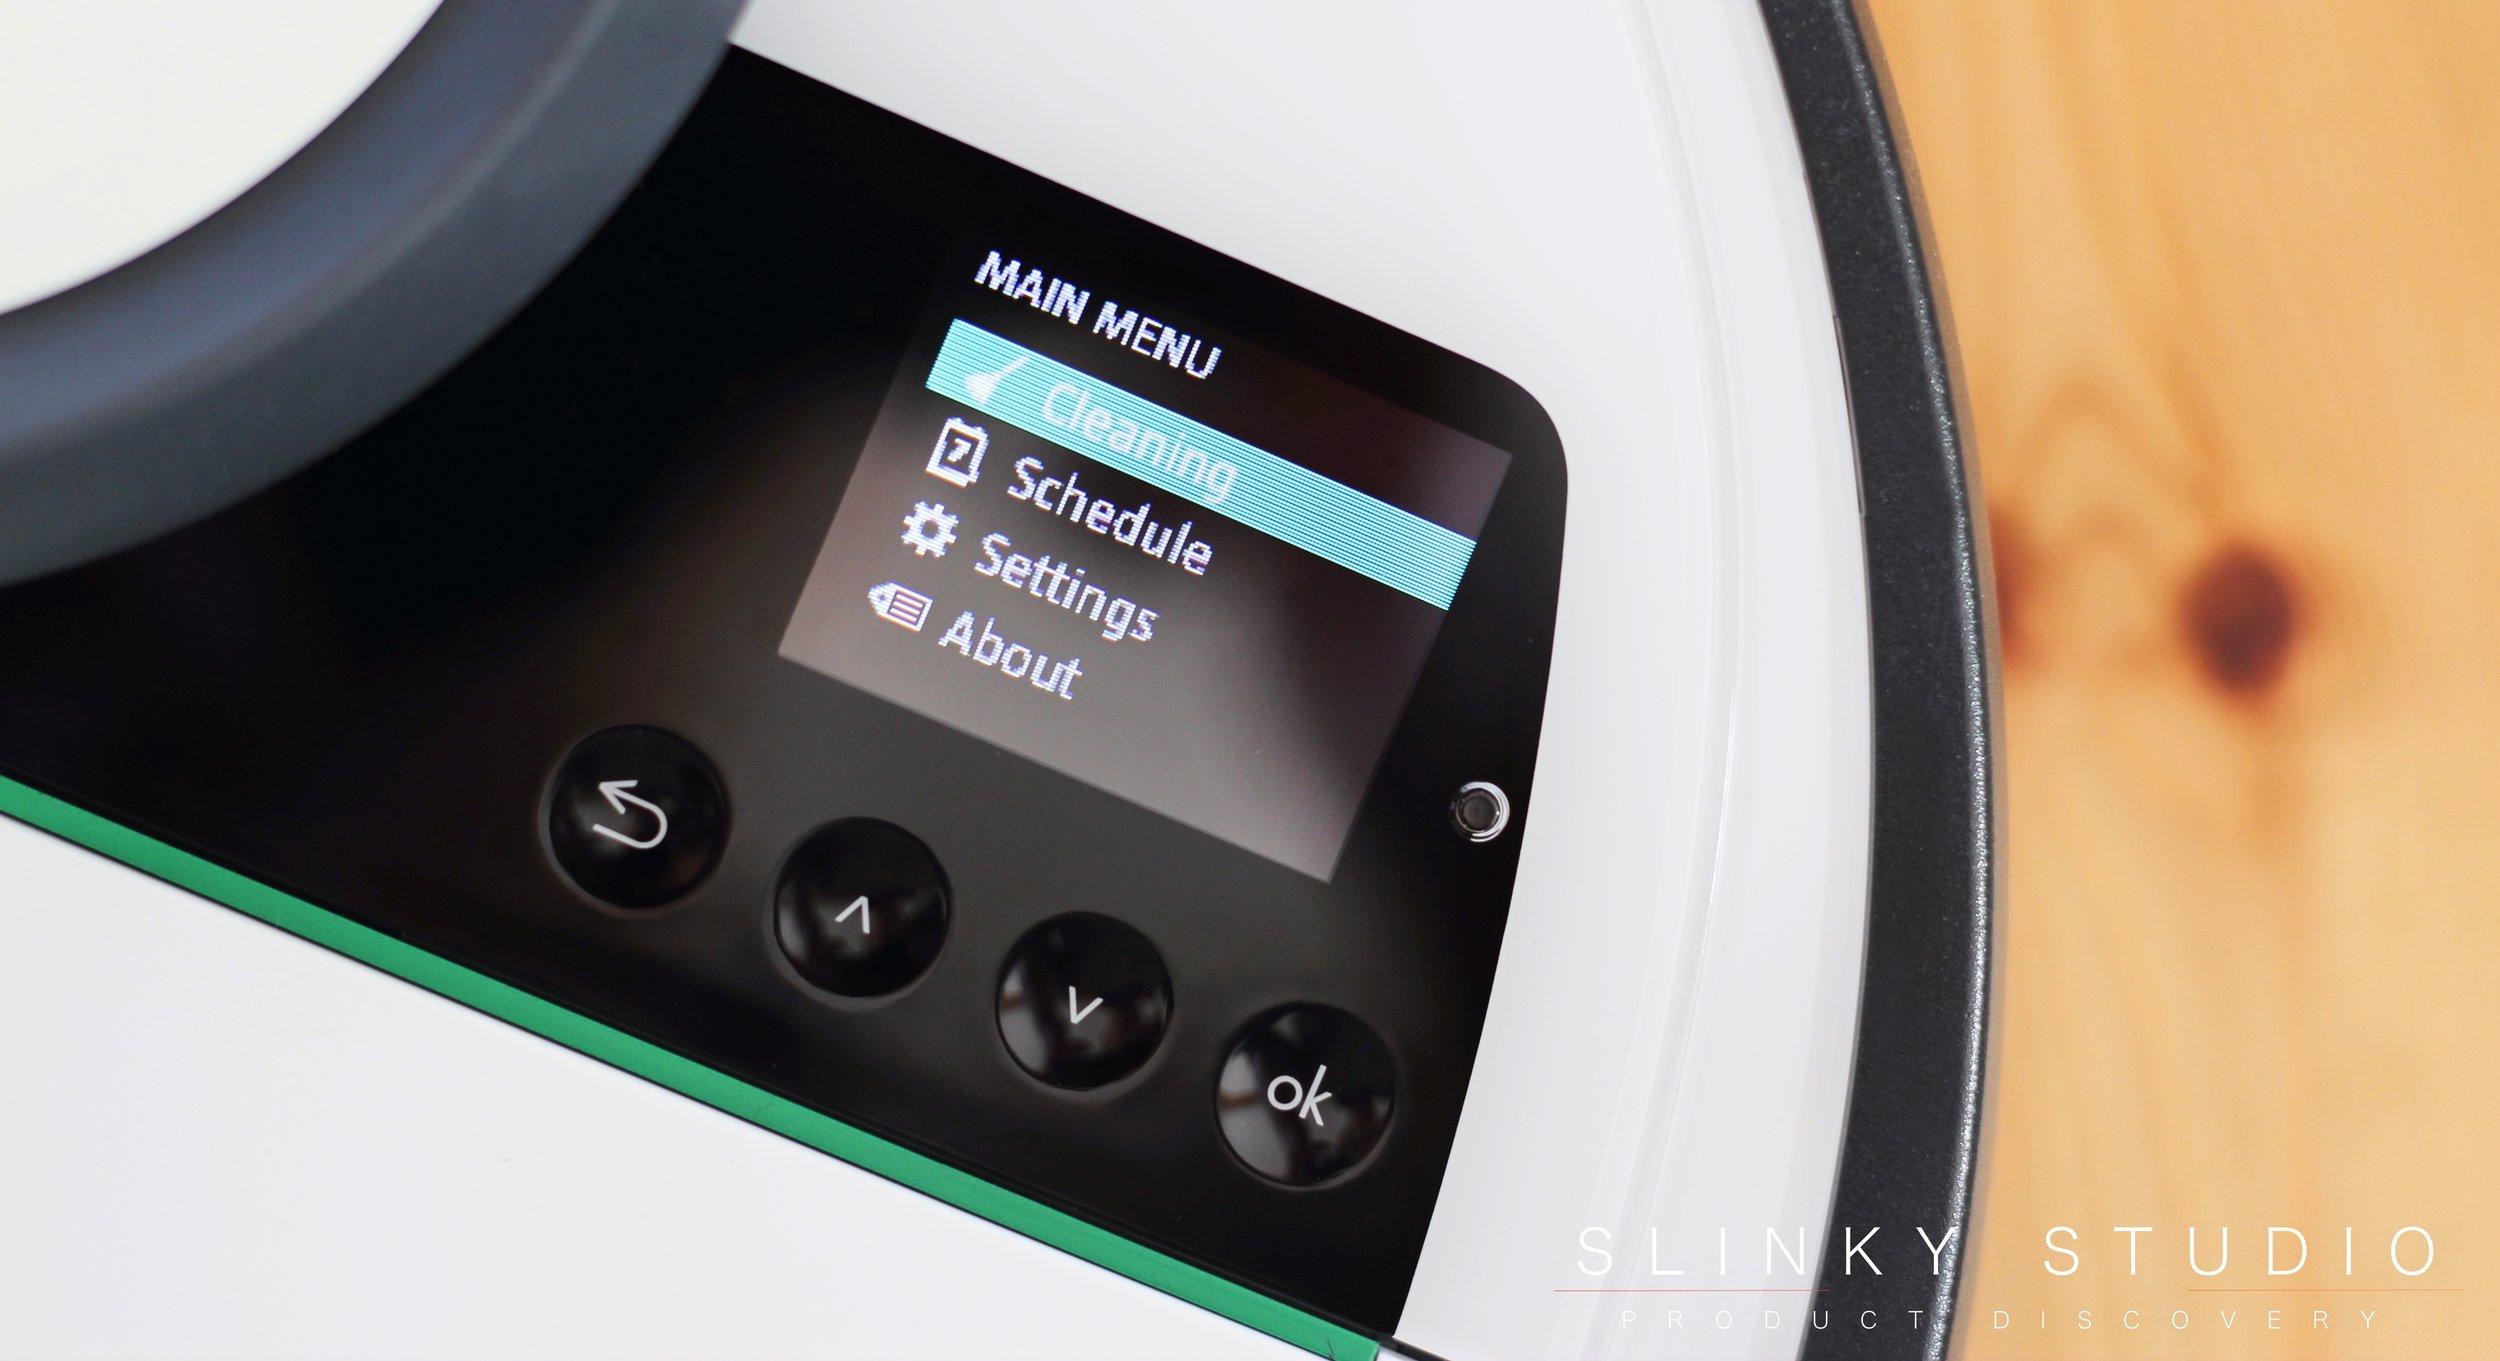 Vorwerk Kobold VR200 Robot Cleaner Controls Screen Menu.jpg